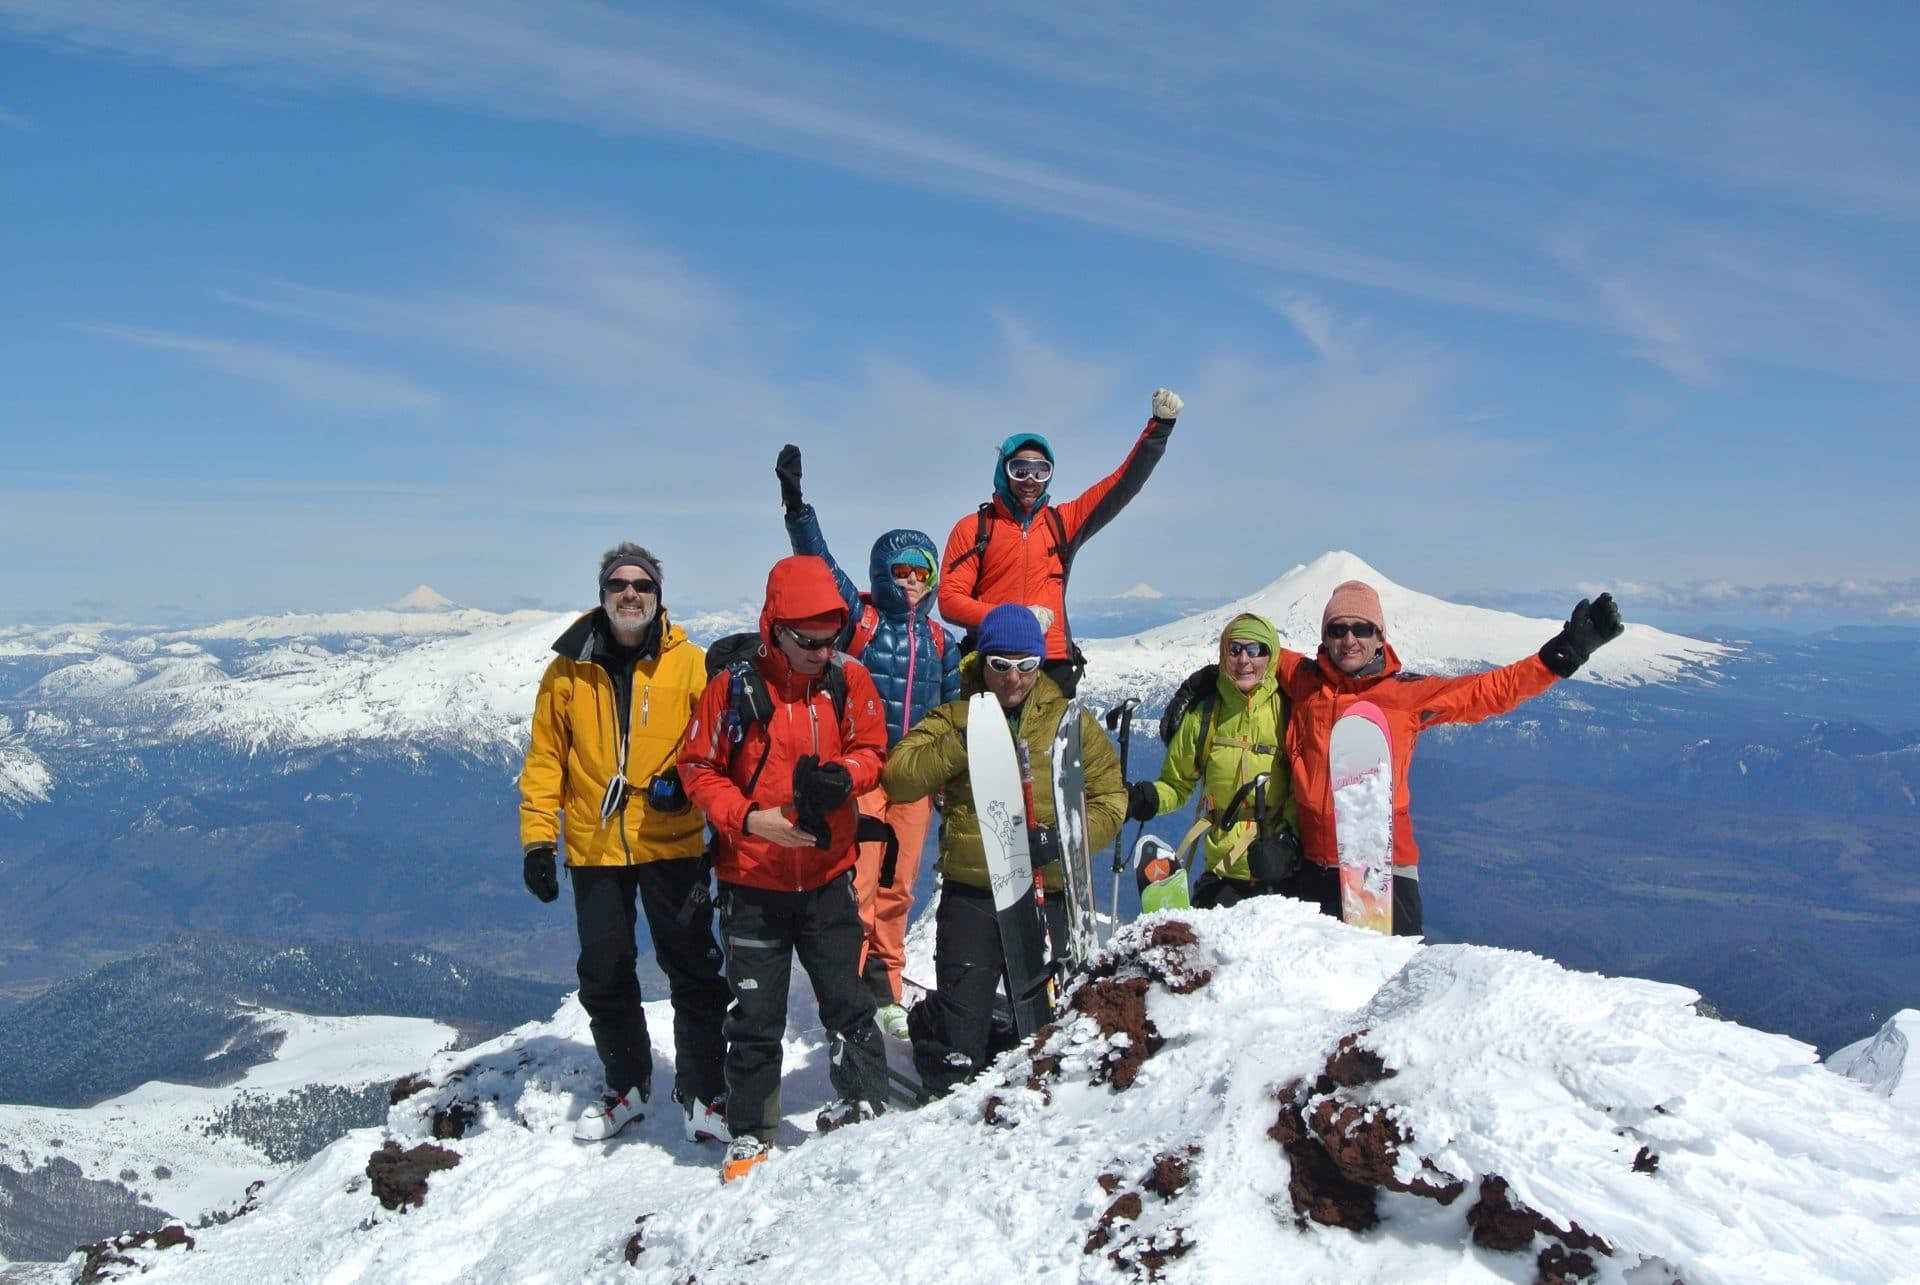 Helyum_Xavier-Carrard_Guide-de-montagne_Ski_Voyage_Argentine_Chili_Volcan-Lonquimay_Clients-Sommet